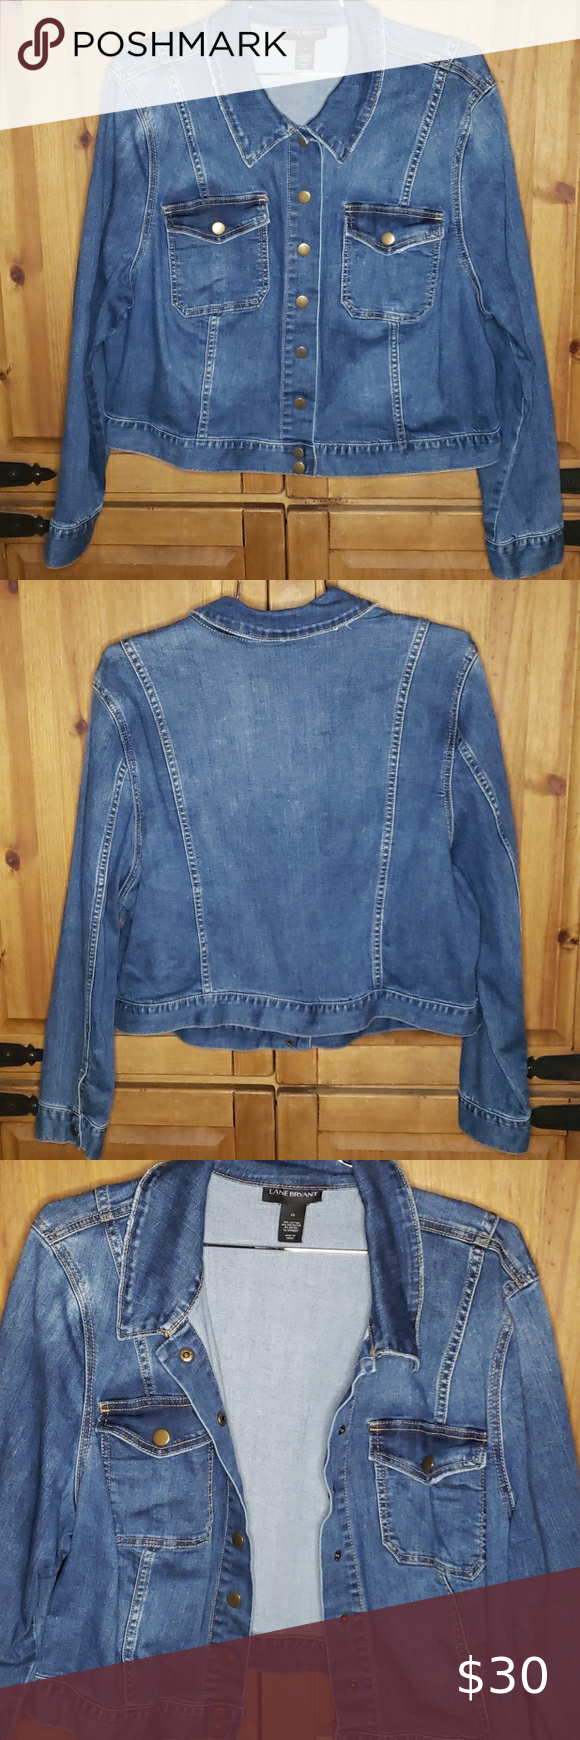 Lane Bryant Denim Jean Jacket Denim Jean Jacket Jean Jacket Denim Jeans [ 1740 x 580 Pixel ]